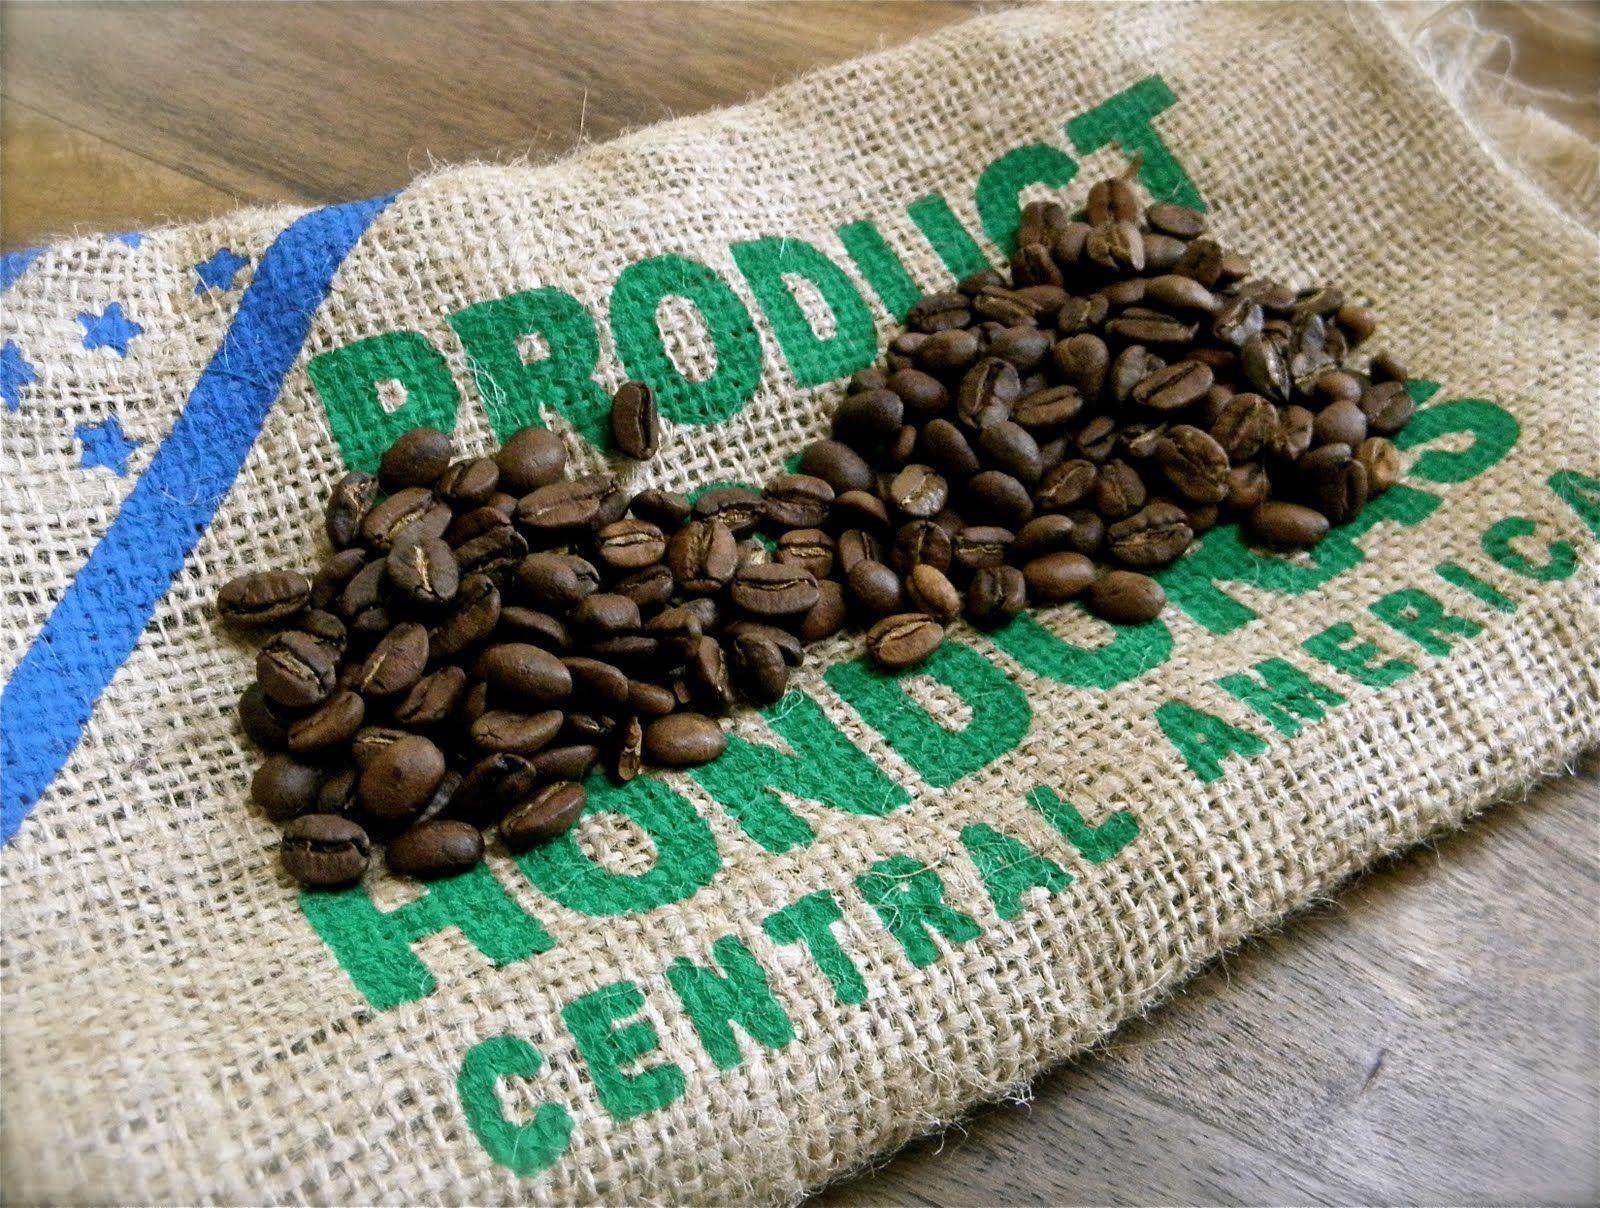 Honduras Fto Expensive Coffee Coffee Beans Best Organic Coffee